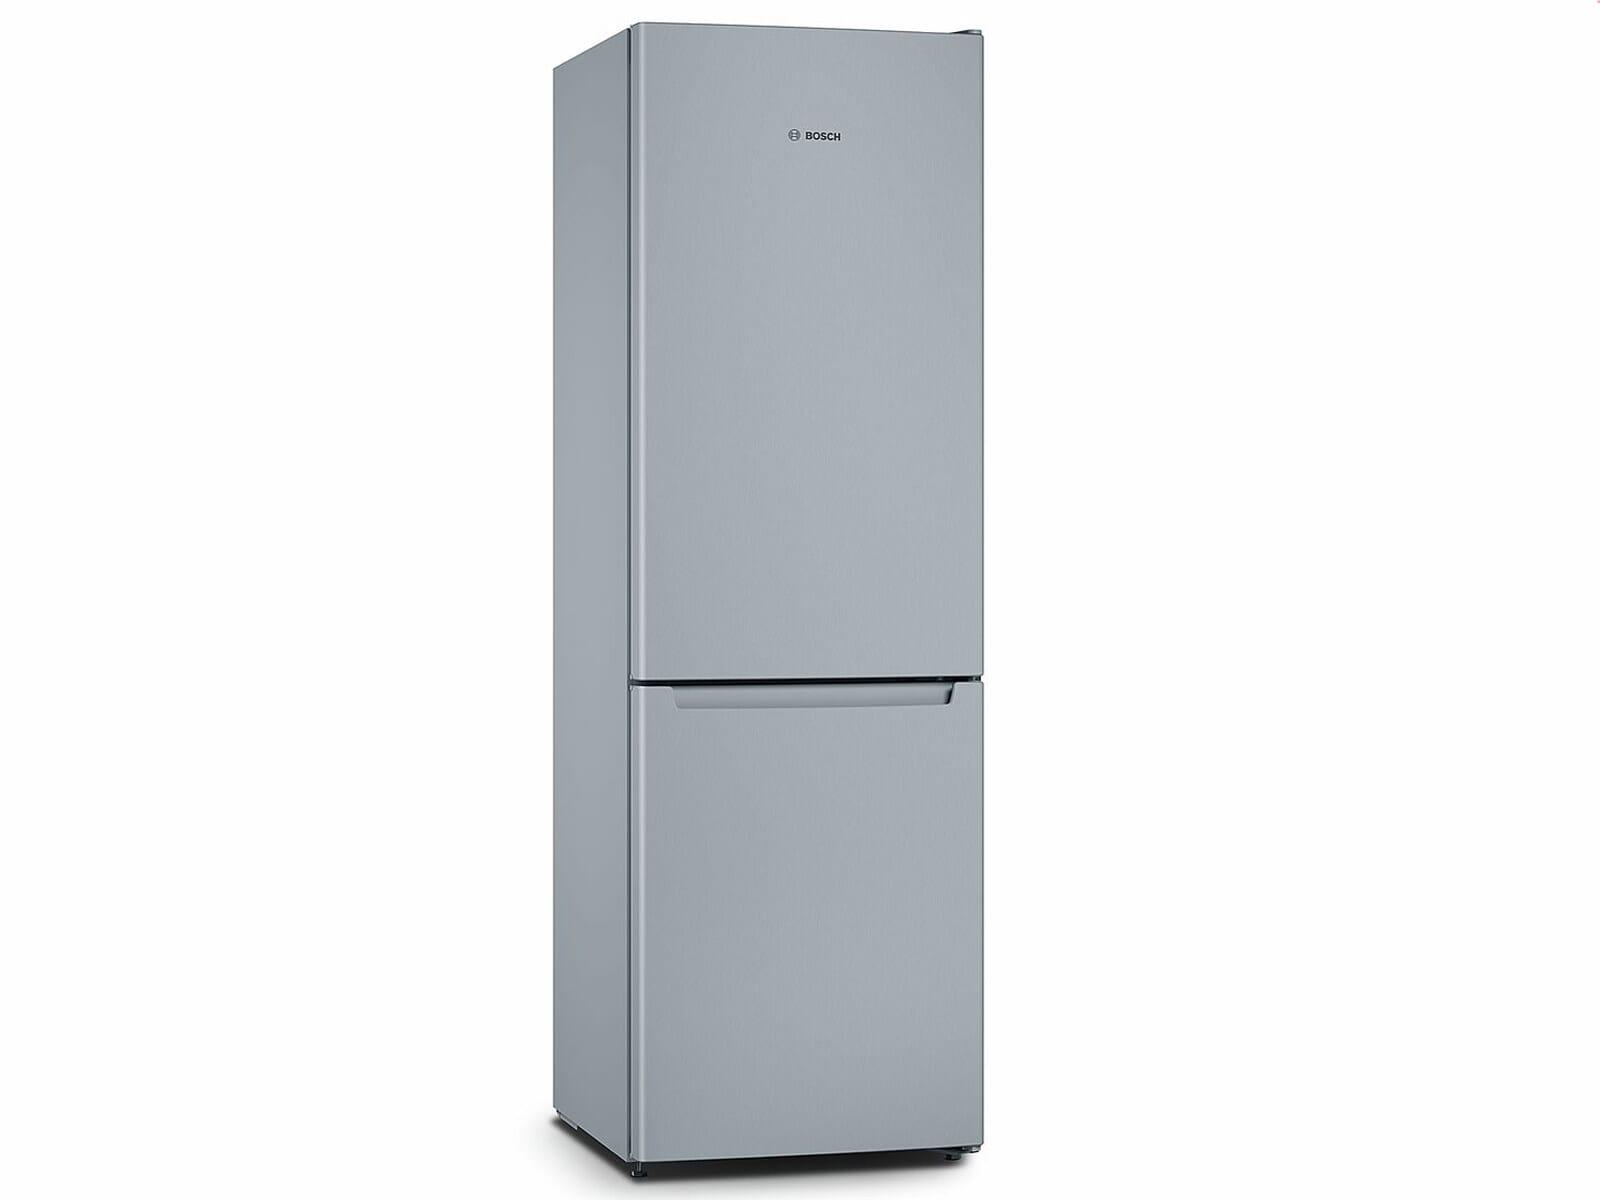 Bosch Kühlschrank Kgn 36 Xi 45 : Bosch kgn36nl30 kühl gefrierkombination edelstahl optik